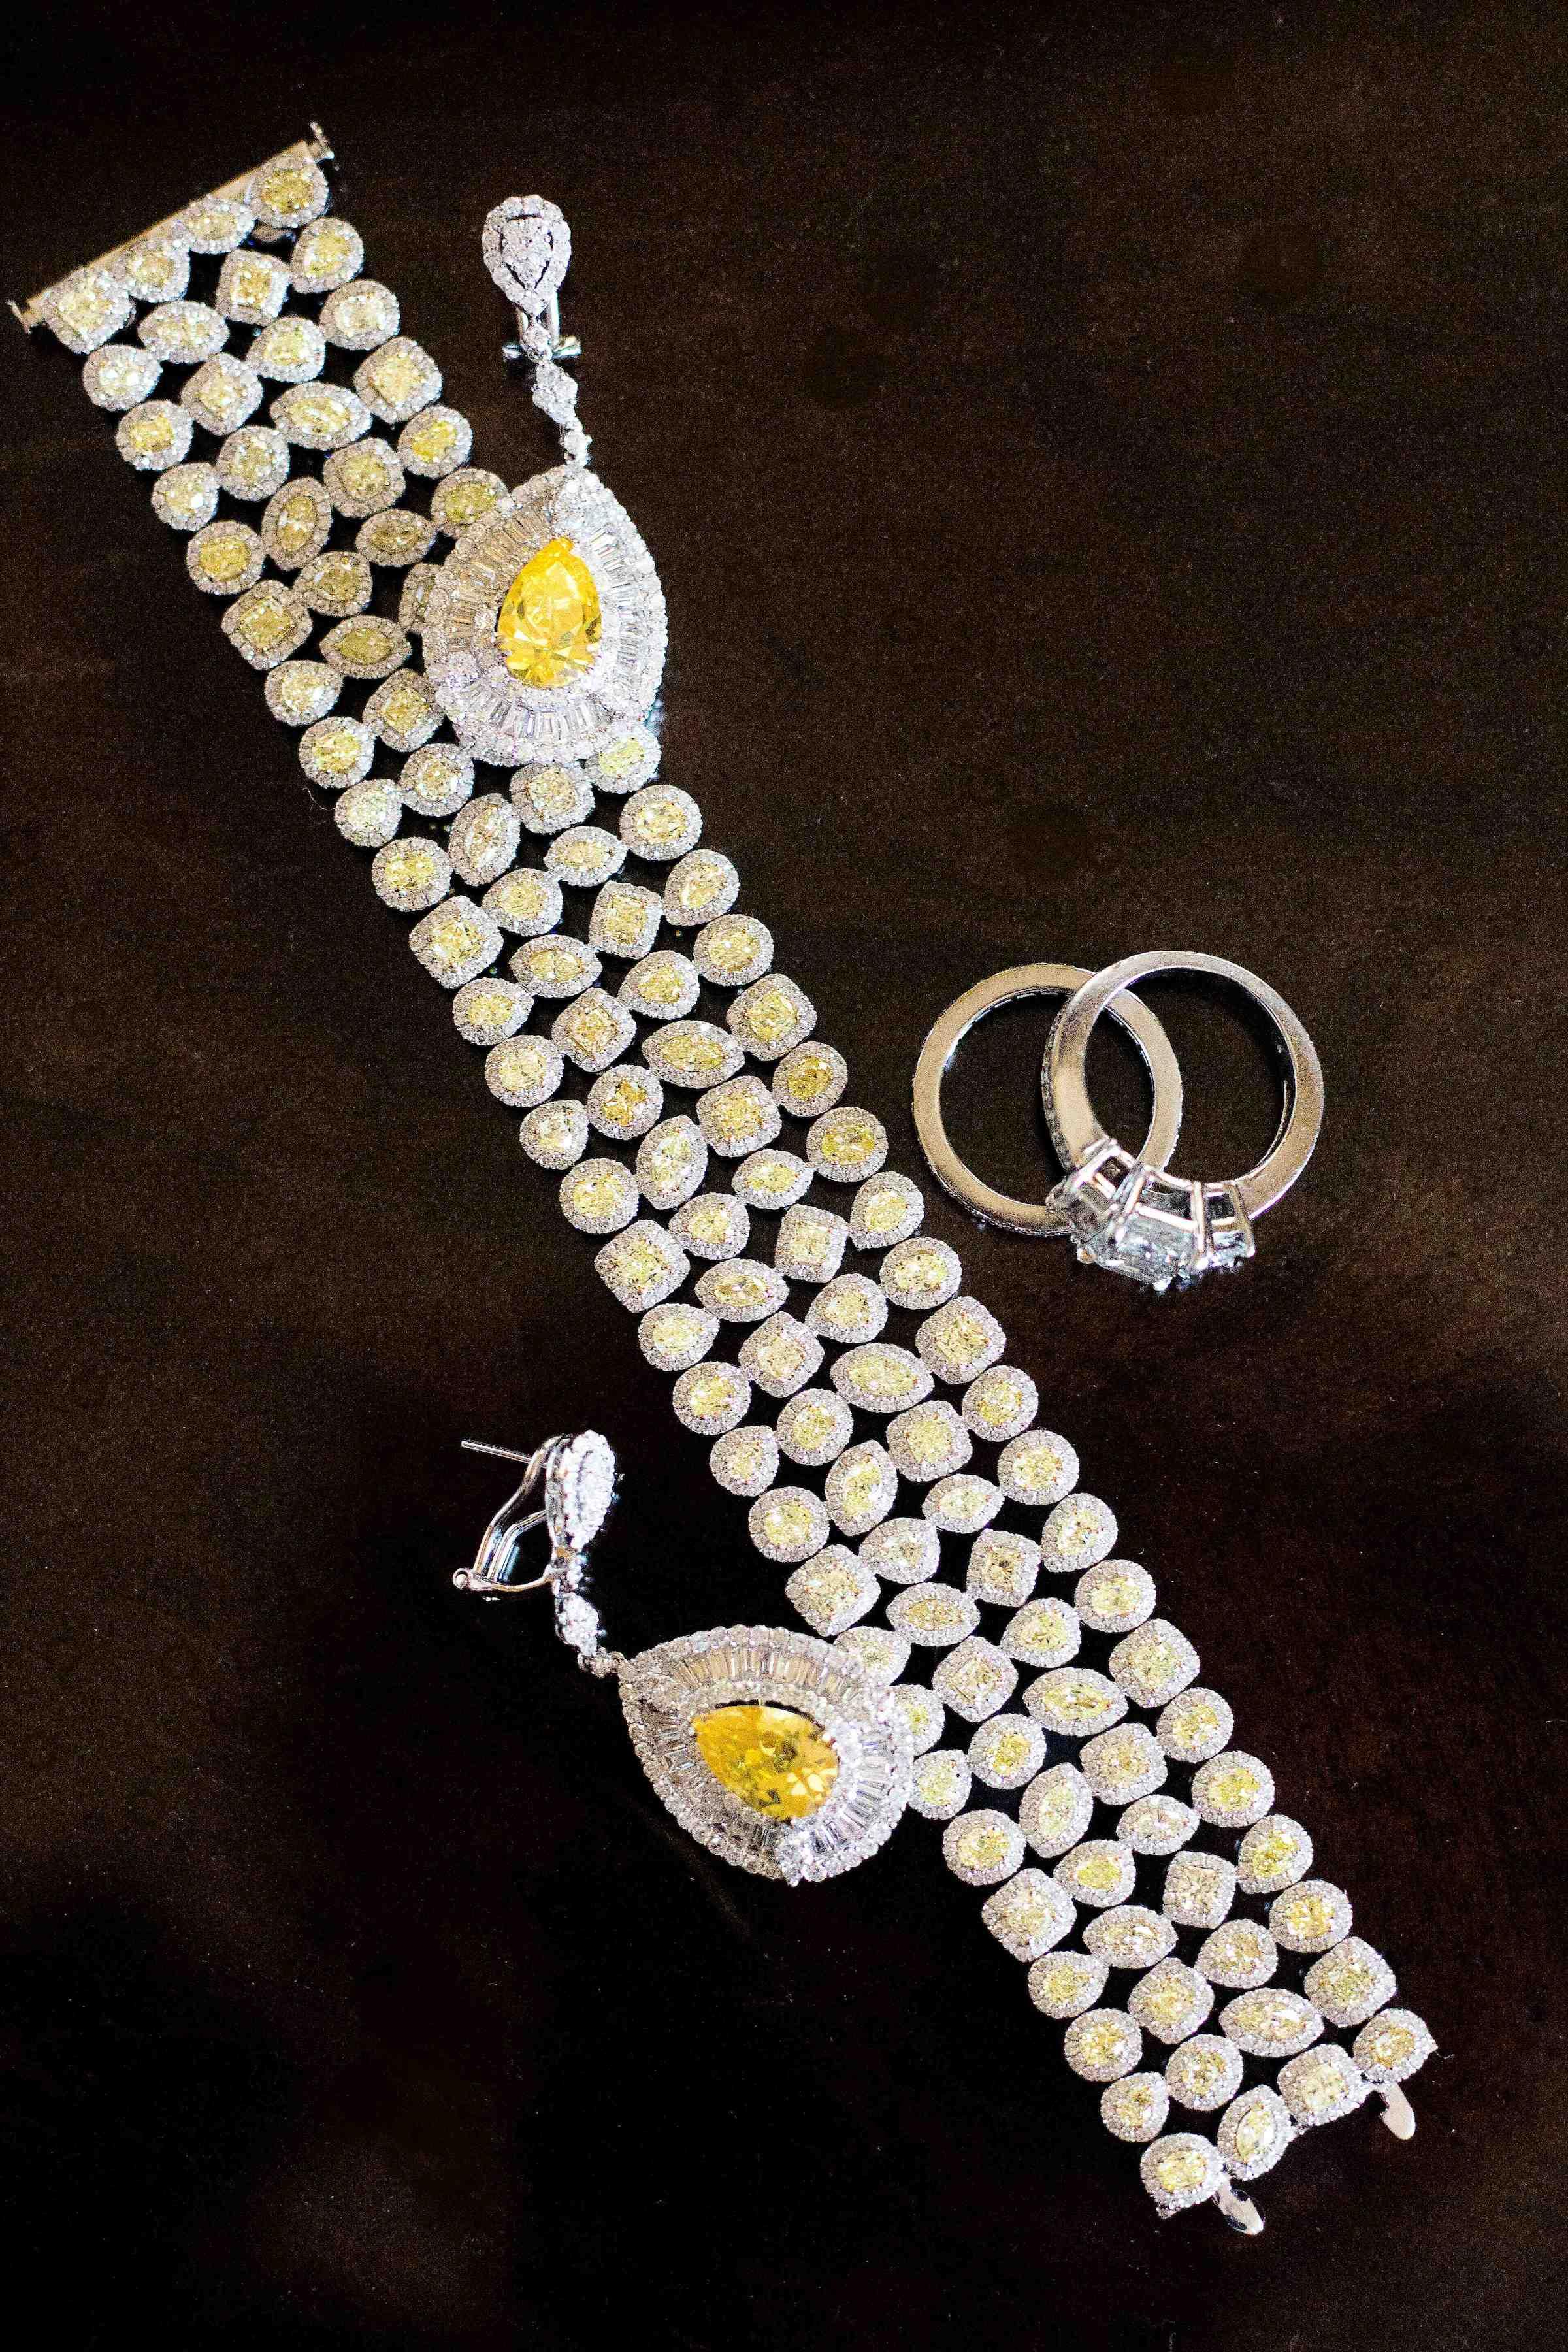 Yellow diamond bracelet and earrings